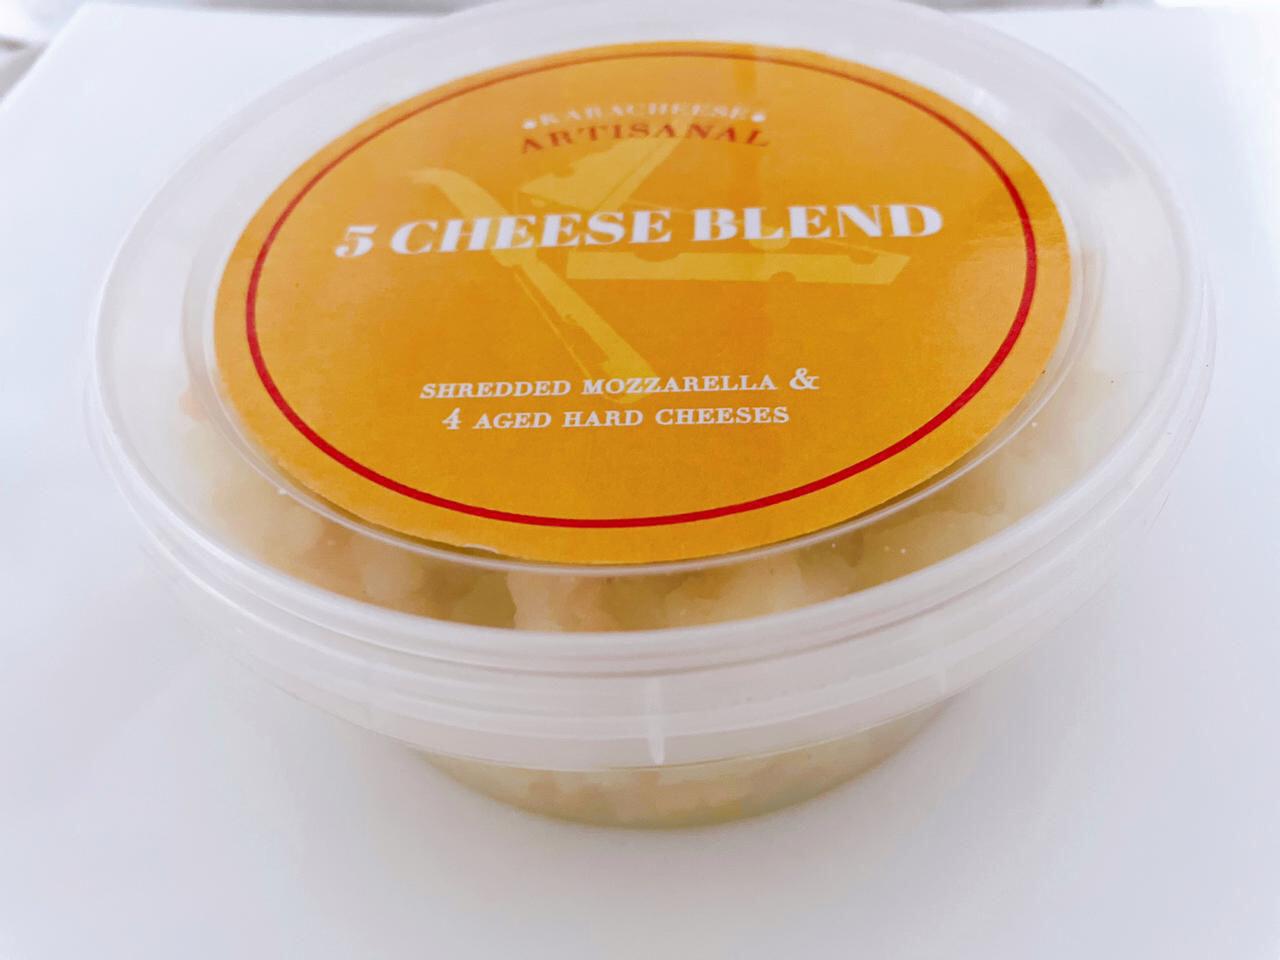 5 Cheese Blend - 200g